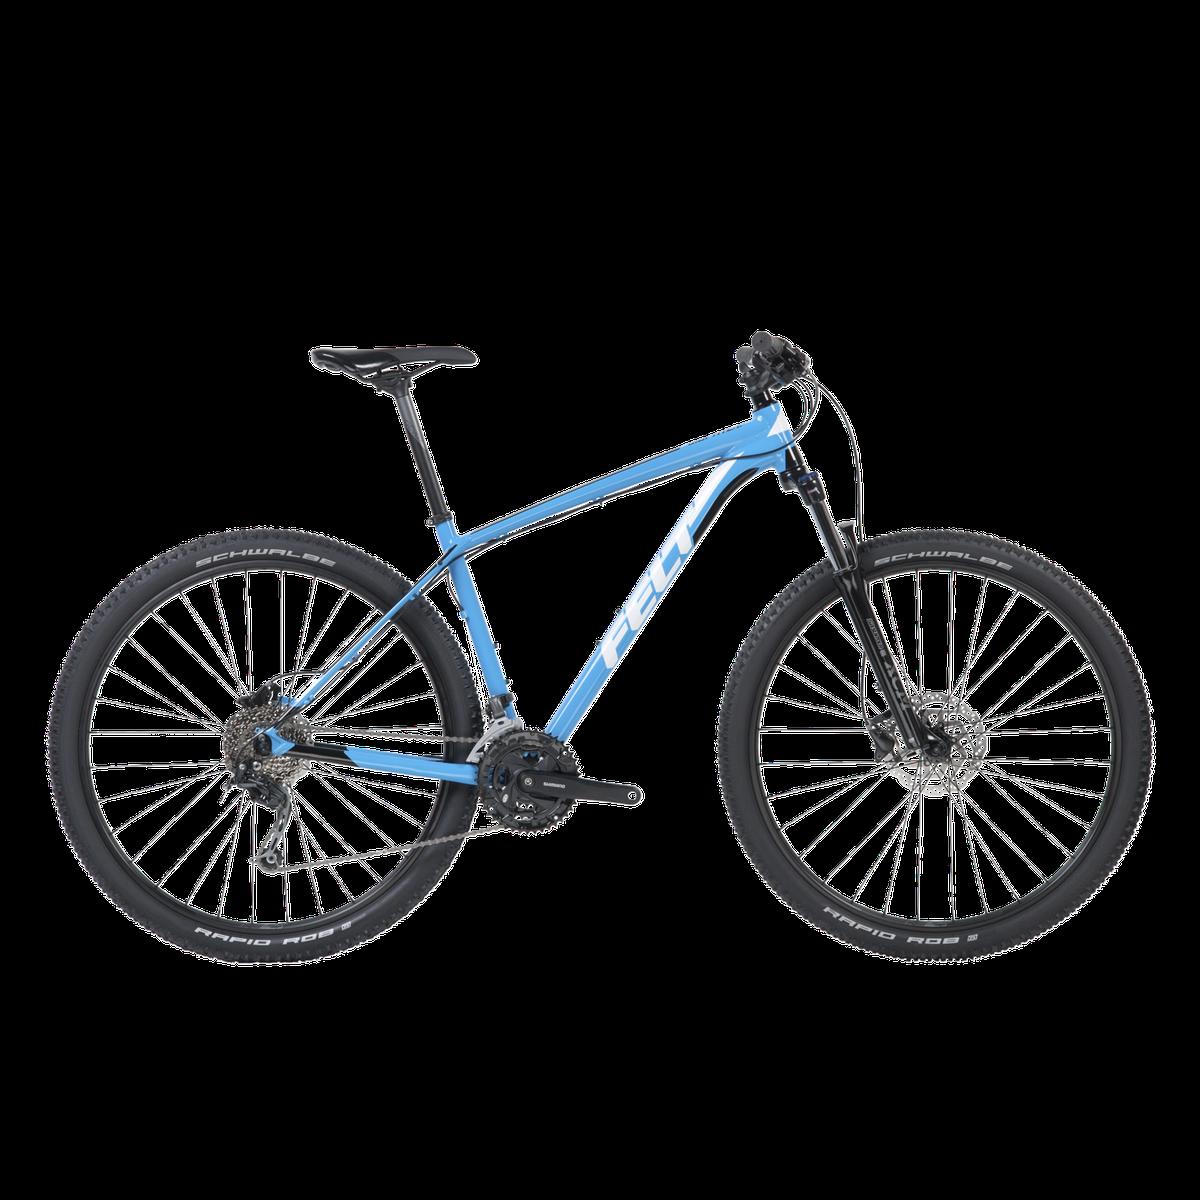 Dispatch 9 60 Deore 18, mountainbike, unisex | MTB